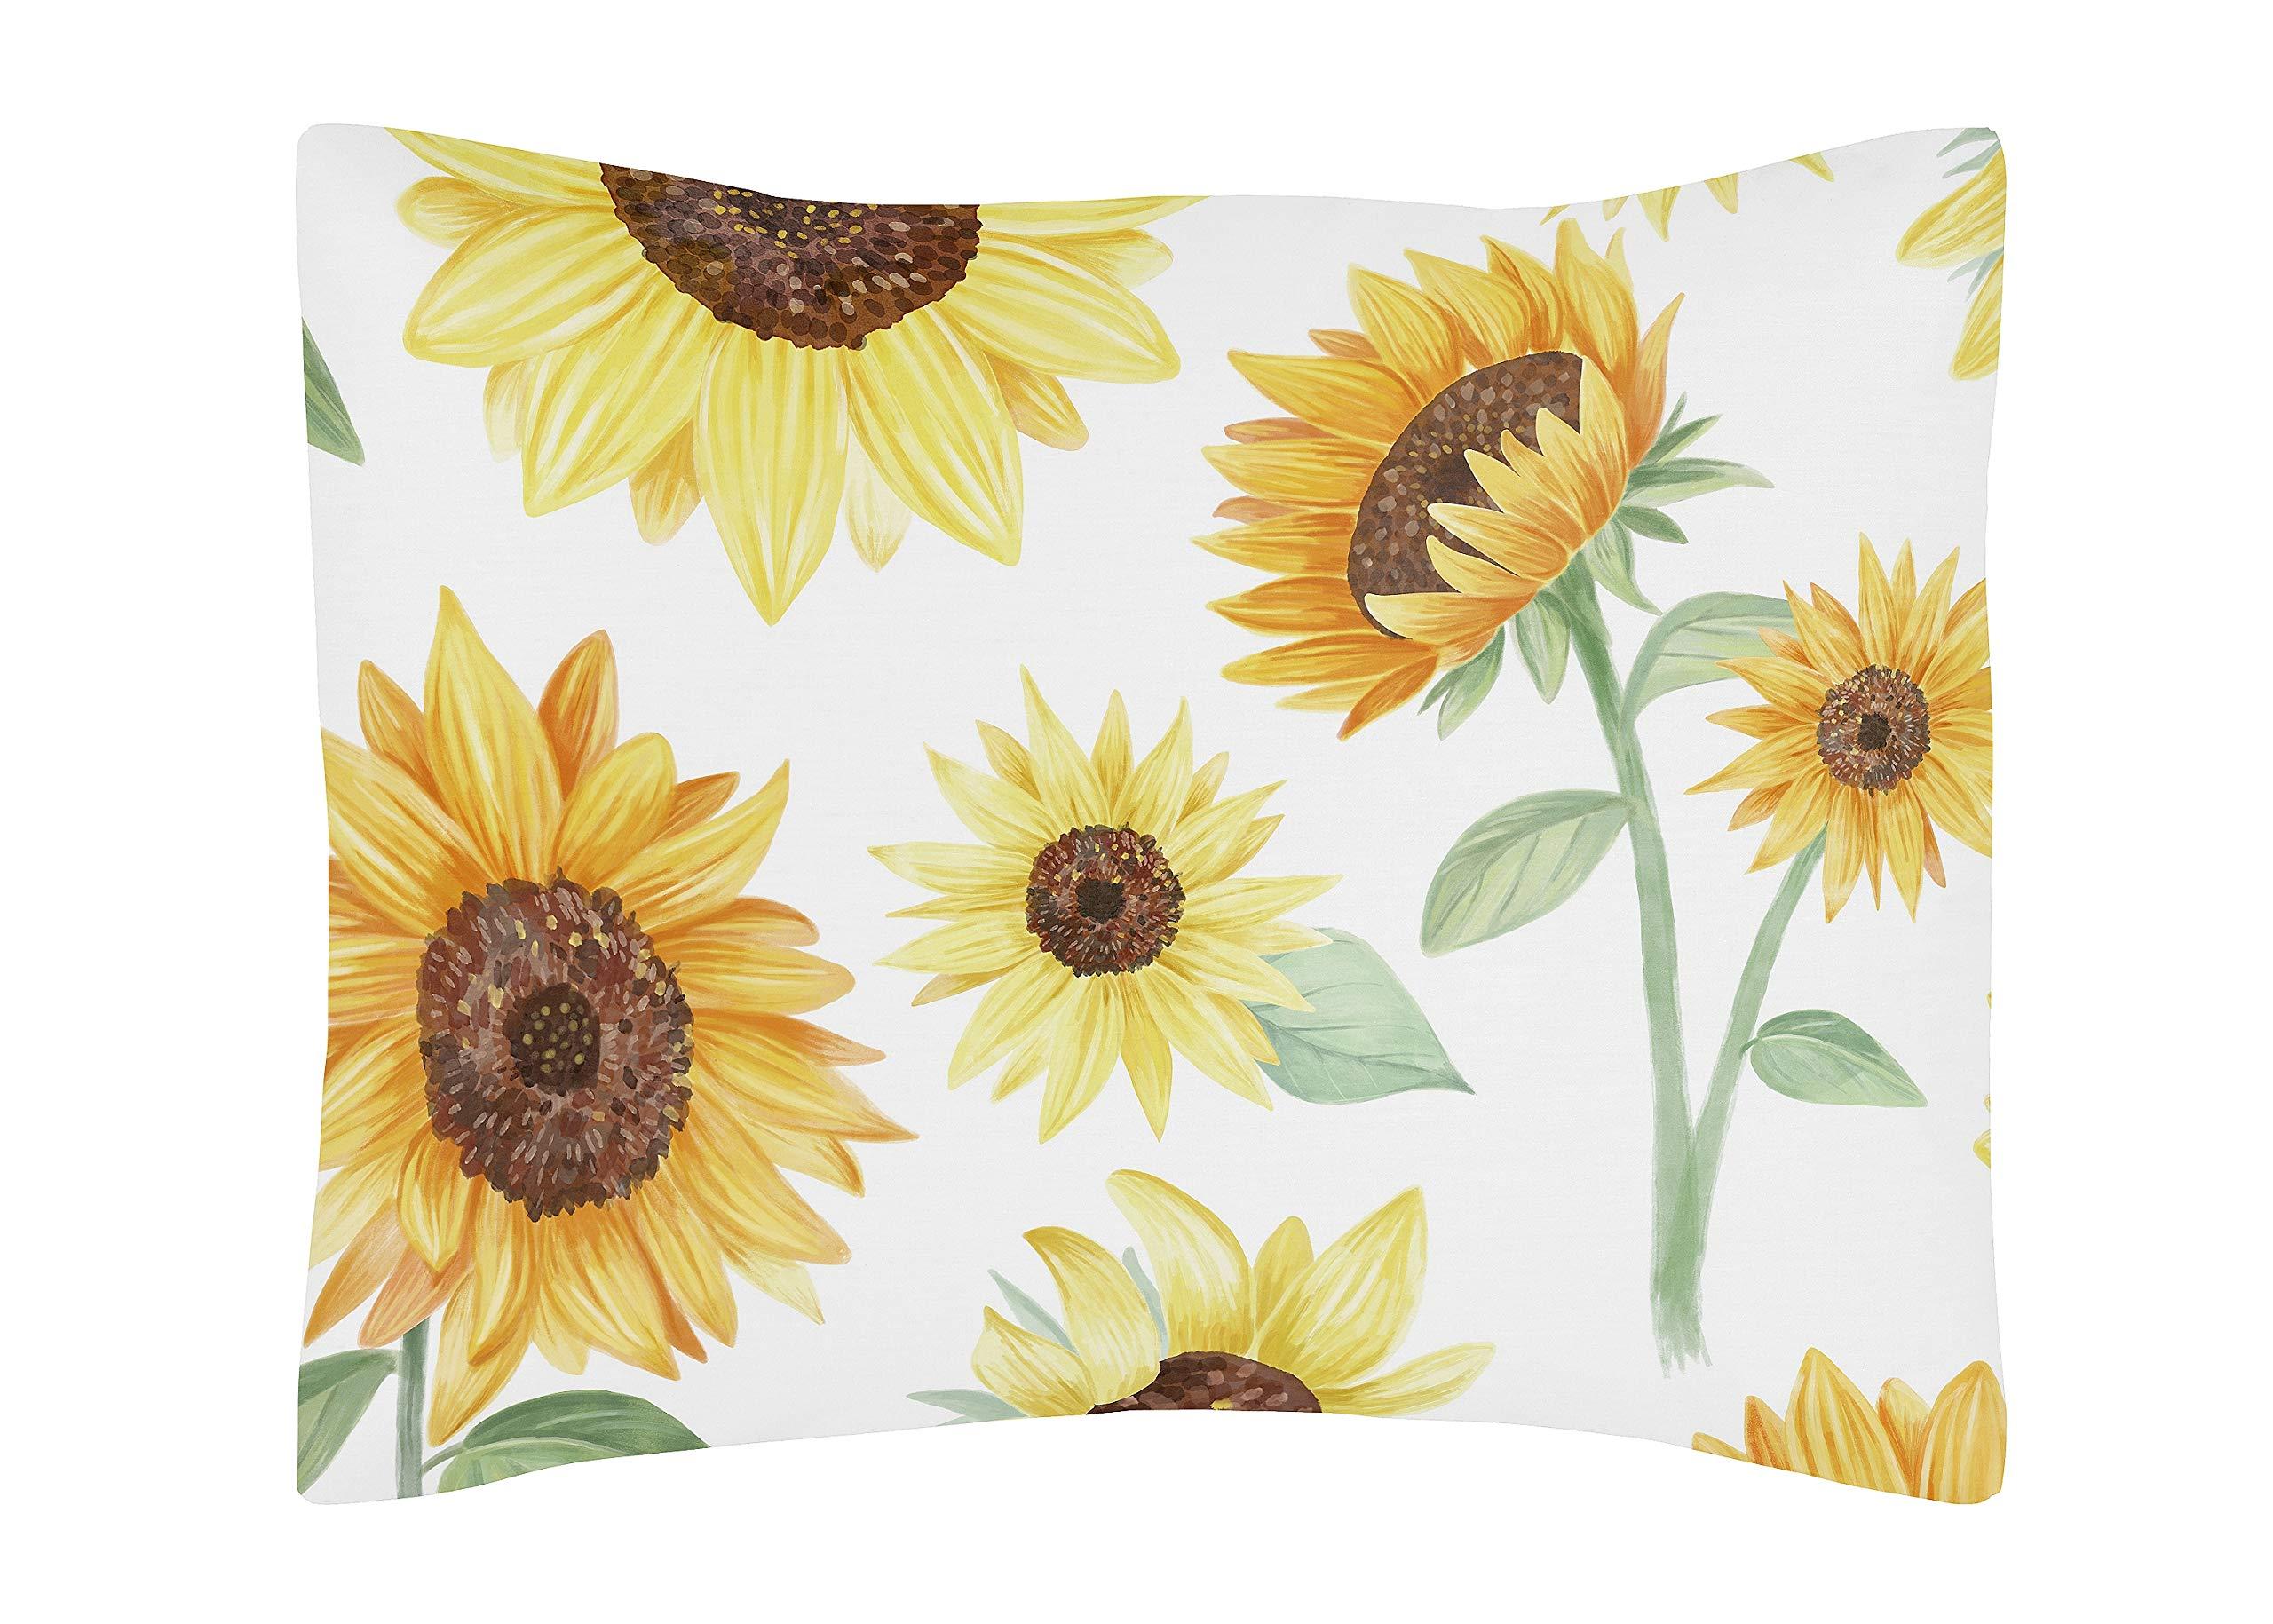 Sweet Jojo Designs Yellow, Green and White Sunflower Boho Floral Standard Pillow Sham - Farmhouse Watercolor Flower